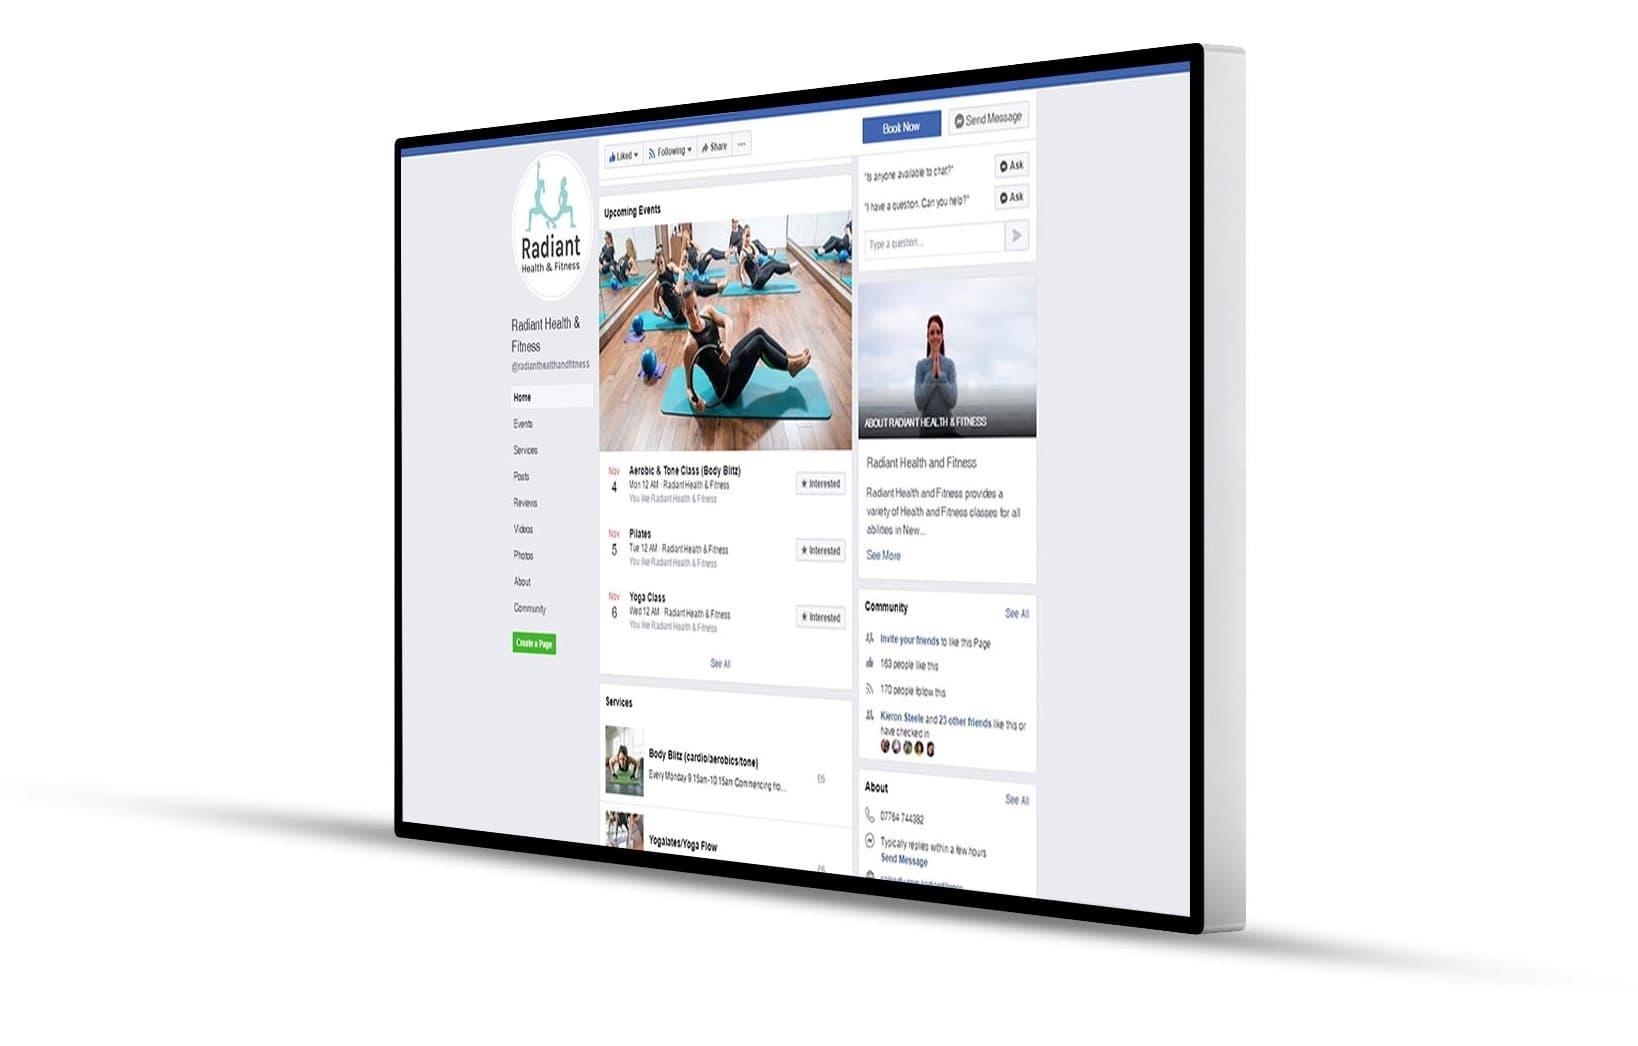 Radiant Fitness social media Cornwall